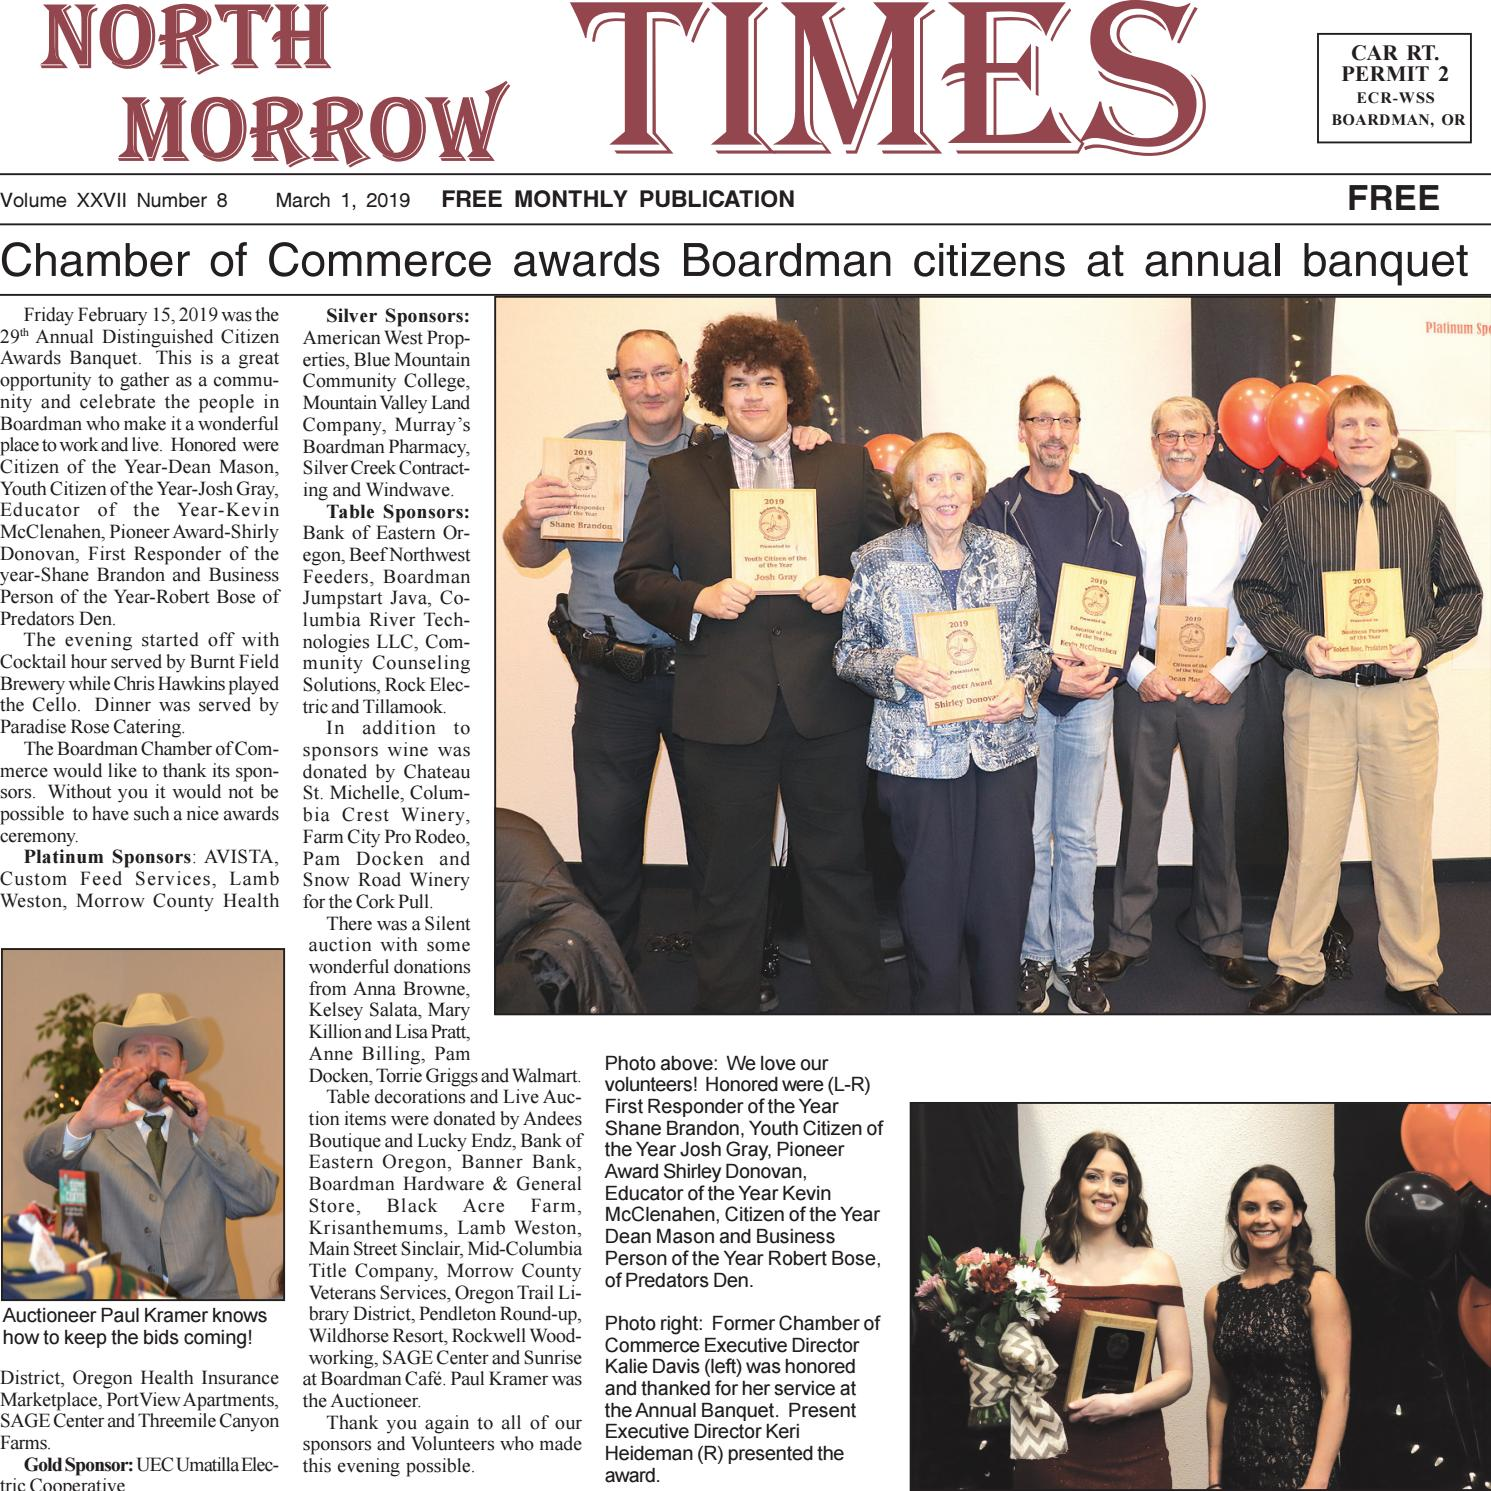 Boardman Calendar February 2019 North Morrow Times March, 2019 edition by North Morrow Times   issuu